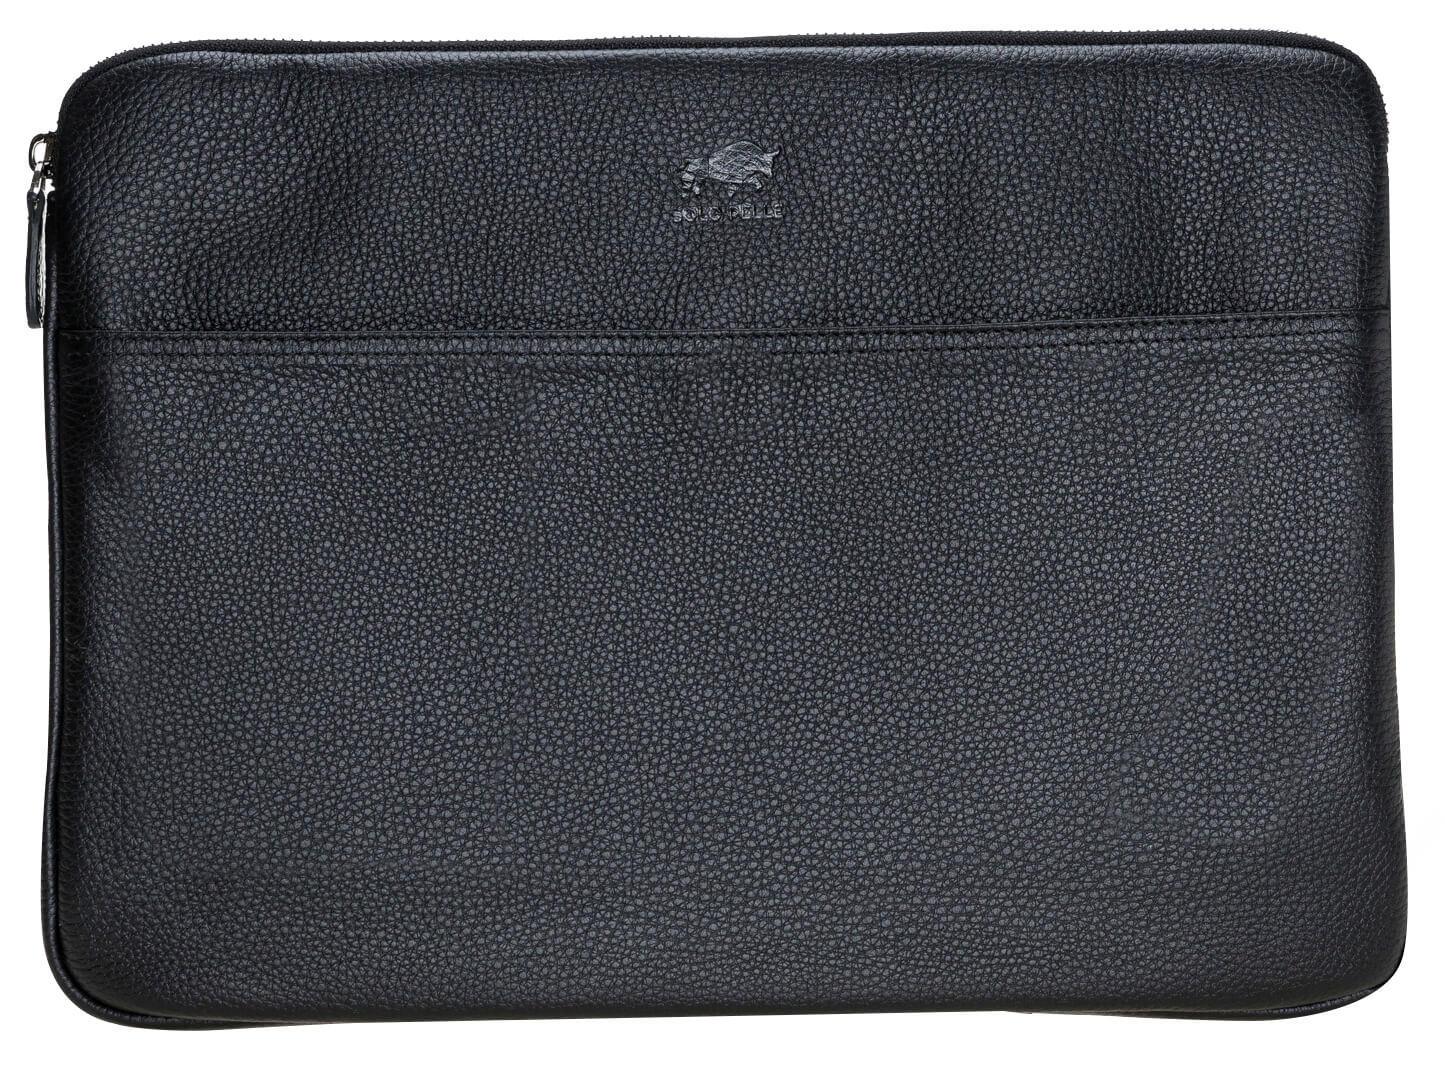 Solo Pelle Ledertasche für das Apple MacBook Pro und Air 13 Zoll, 12 Zoll & iPad Pro 12,9 Zoll Lederhülle Case Hülle Awenta aus echtem Leder in Schwarz